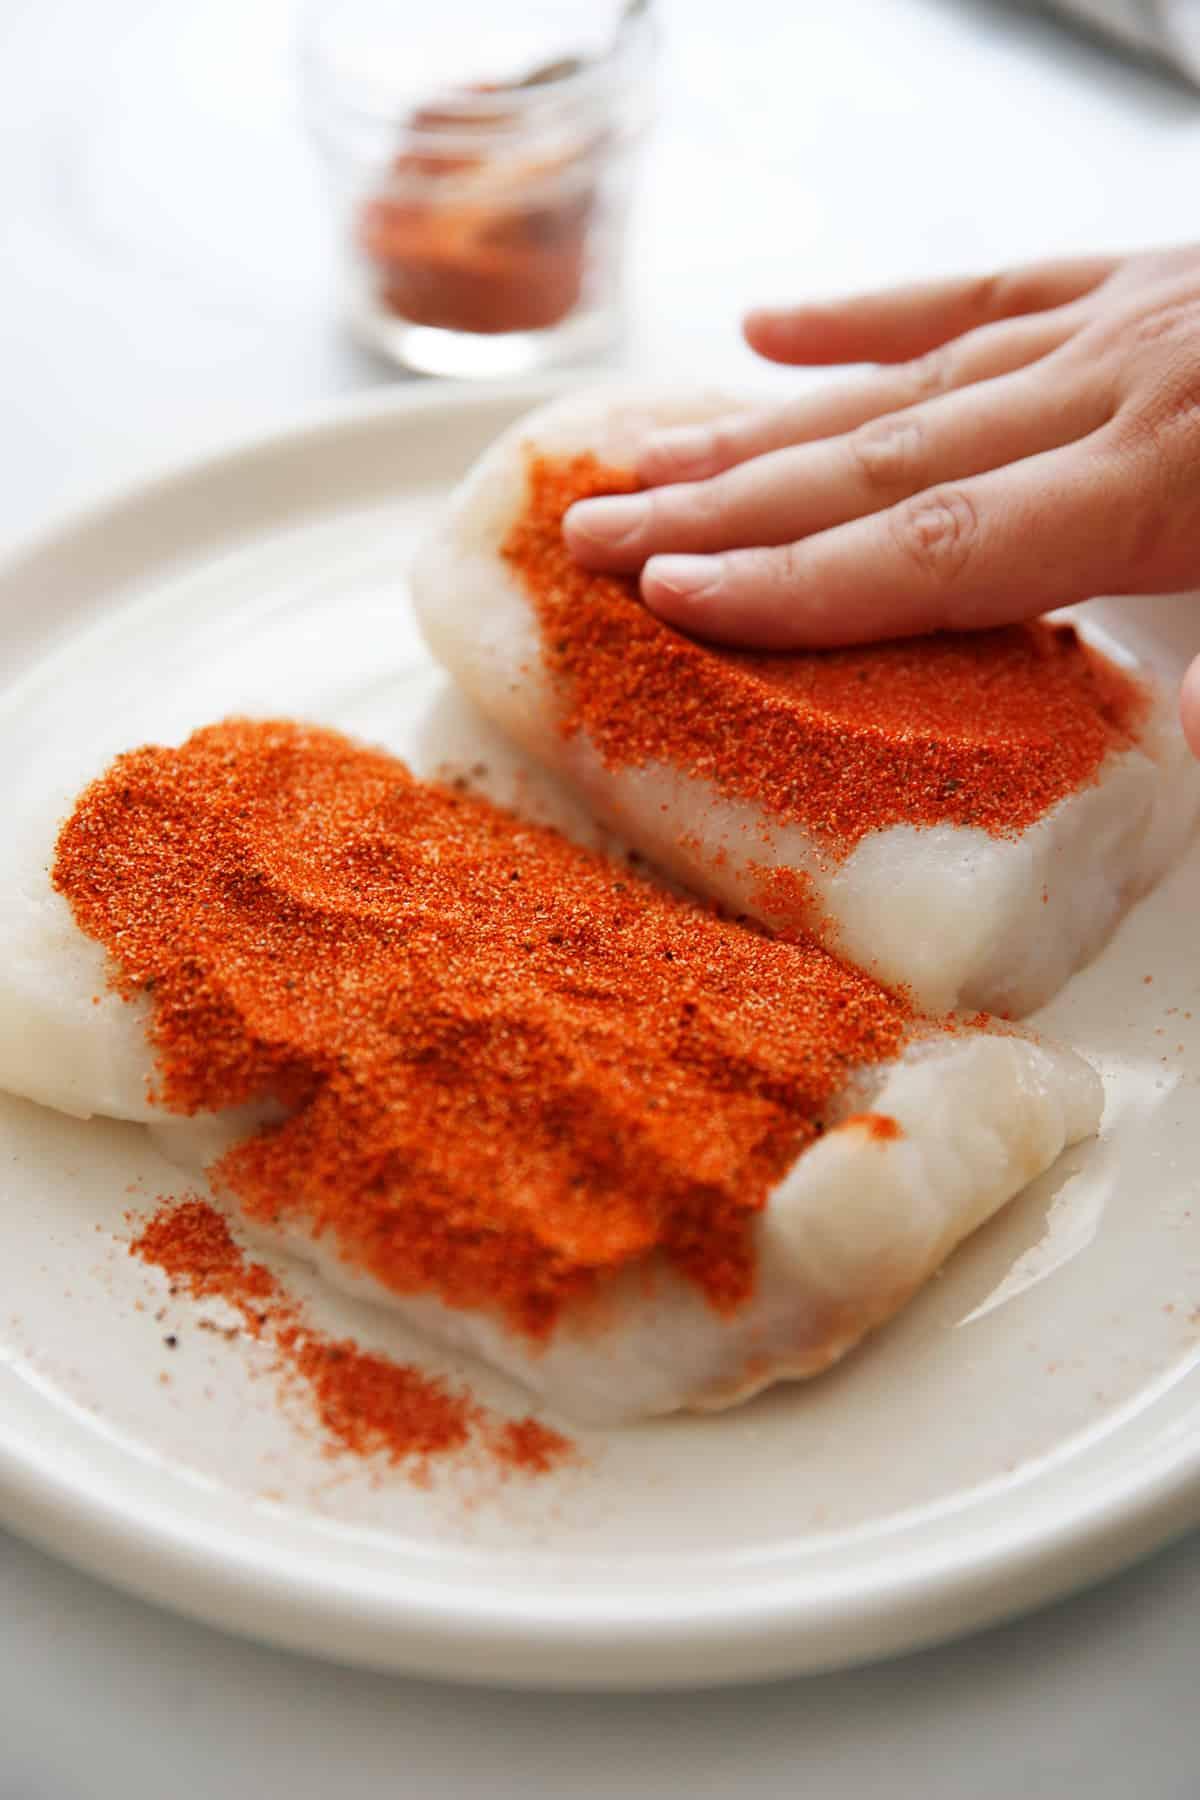 Cajun spice blend on fish